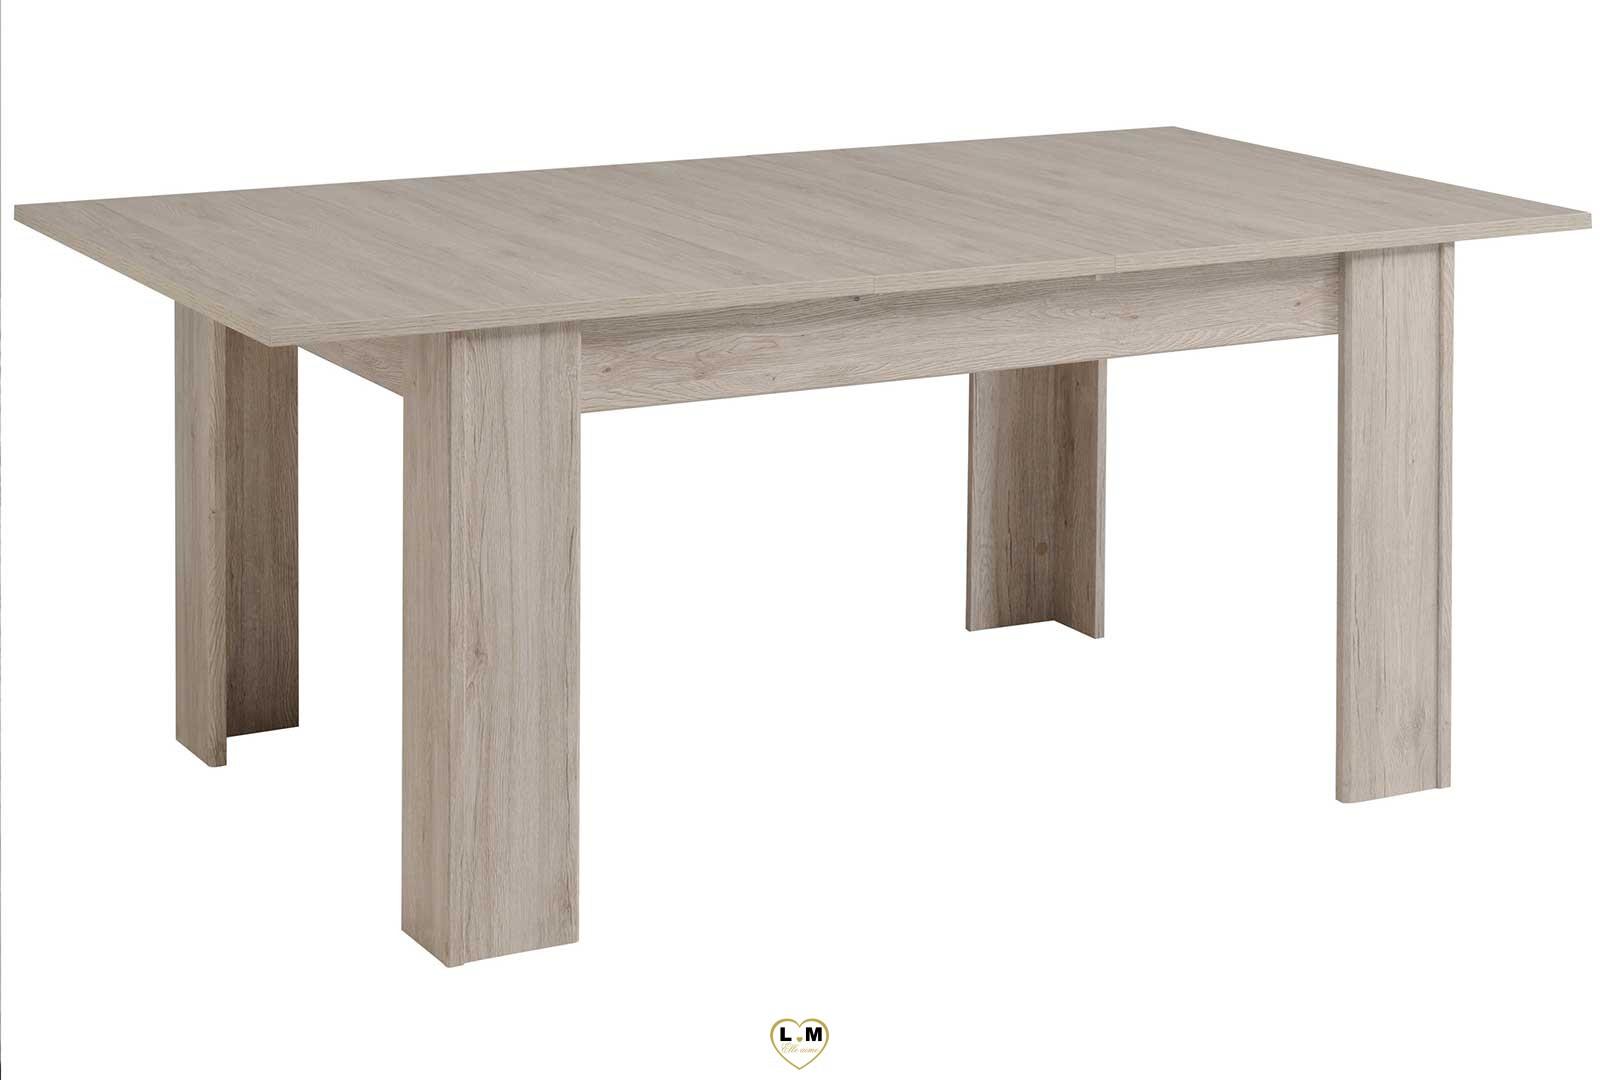 patryk chene gris et blanc table repas lignemeuble com. Black Bedroom Furniture Sets. Home Design Ideas